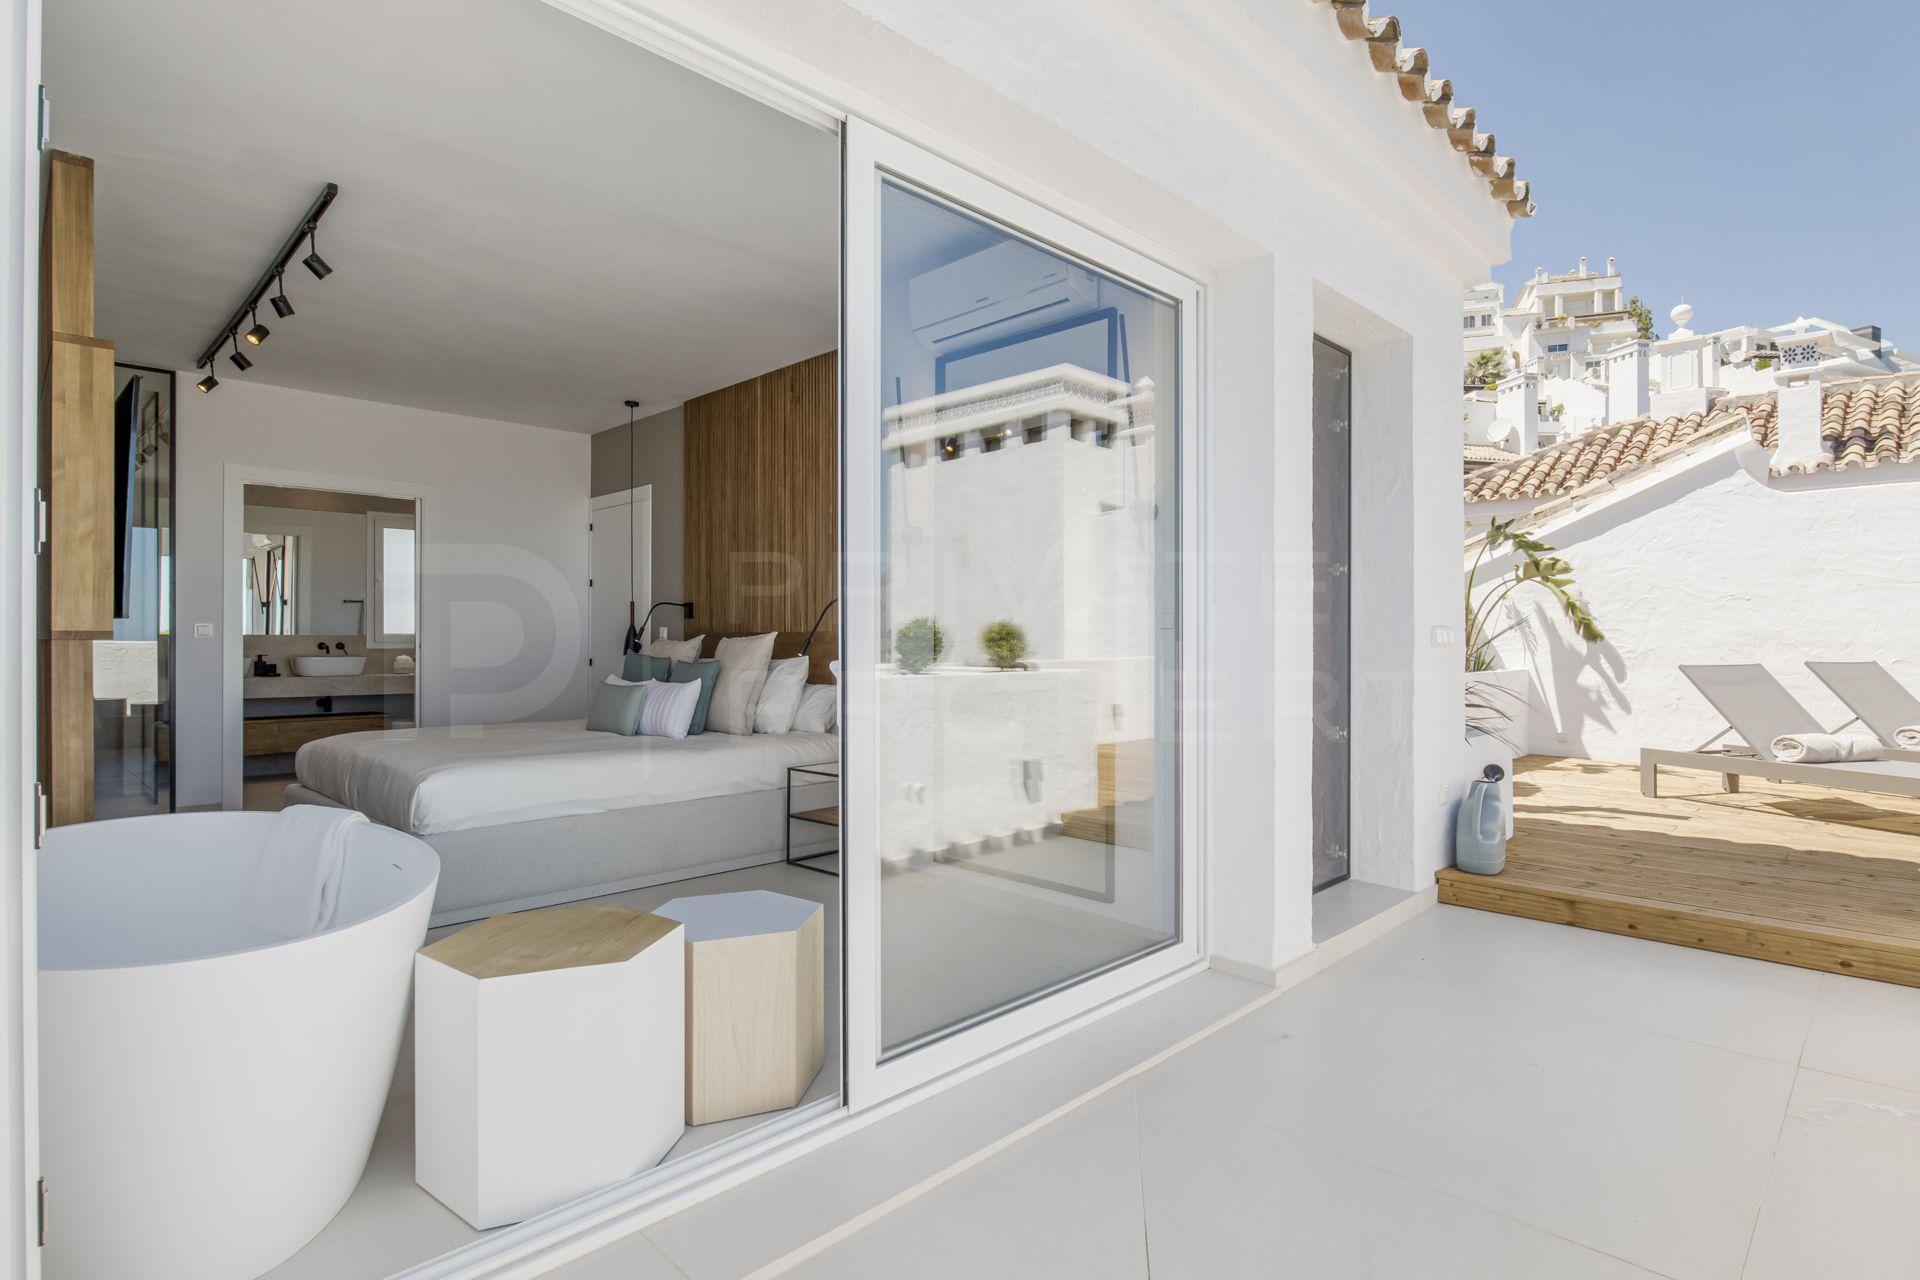 Duplex penthouse in Las Colinas